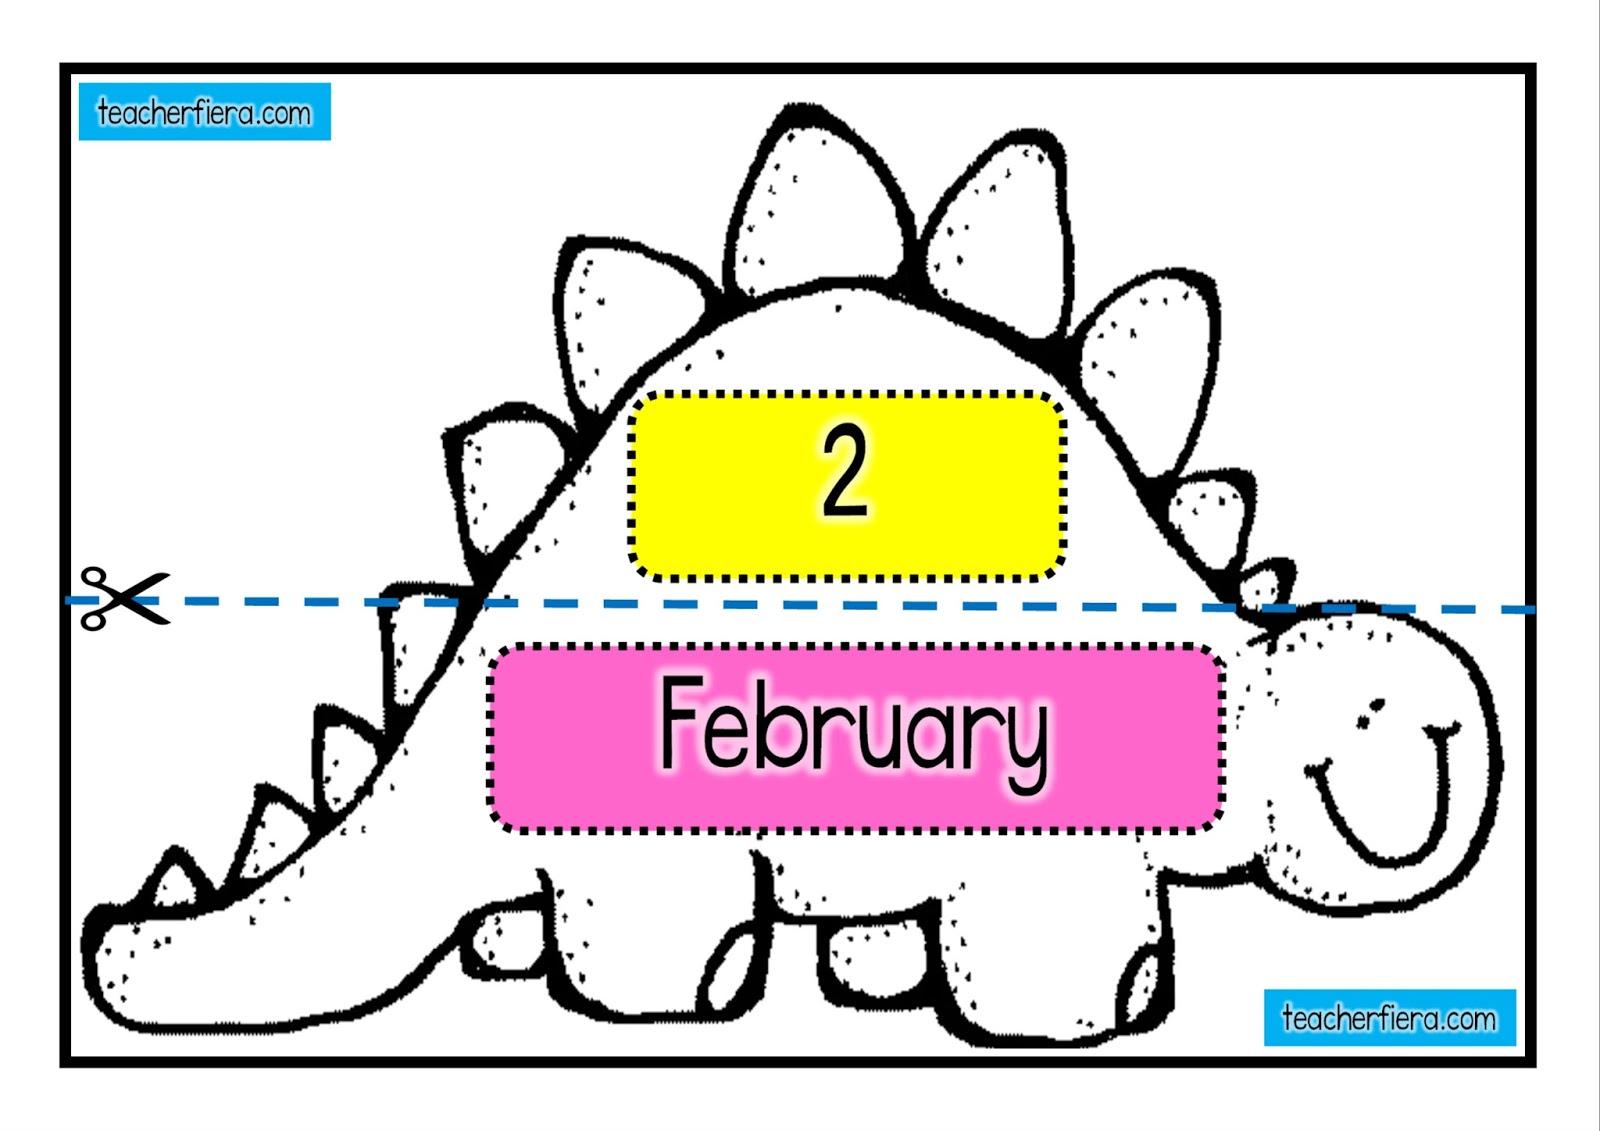 Teacherfiera Months Of The Year Matching Activity